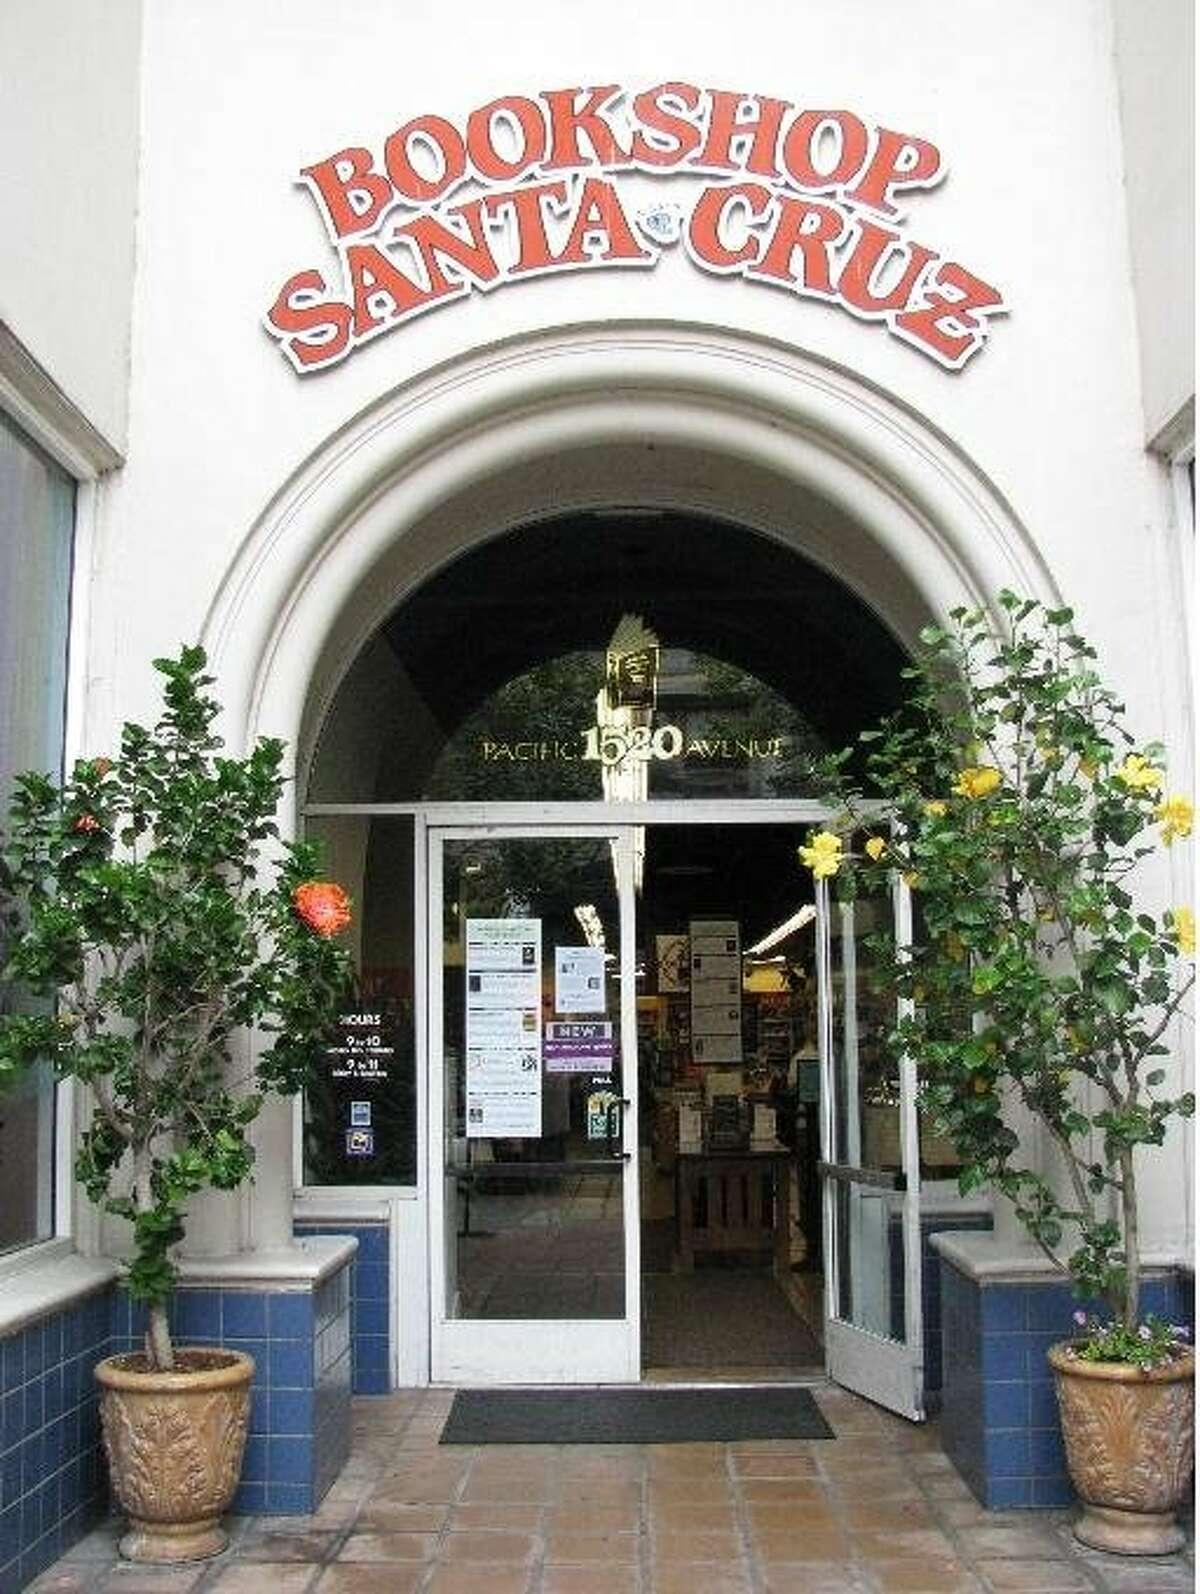 Bookshop Santa Cruz.